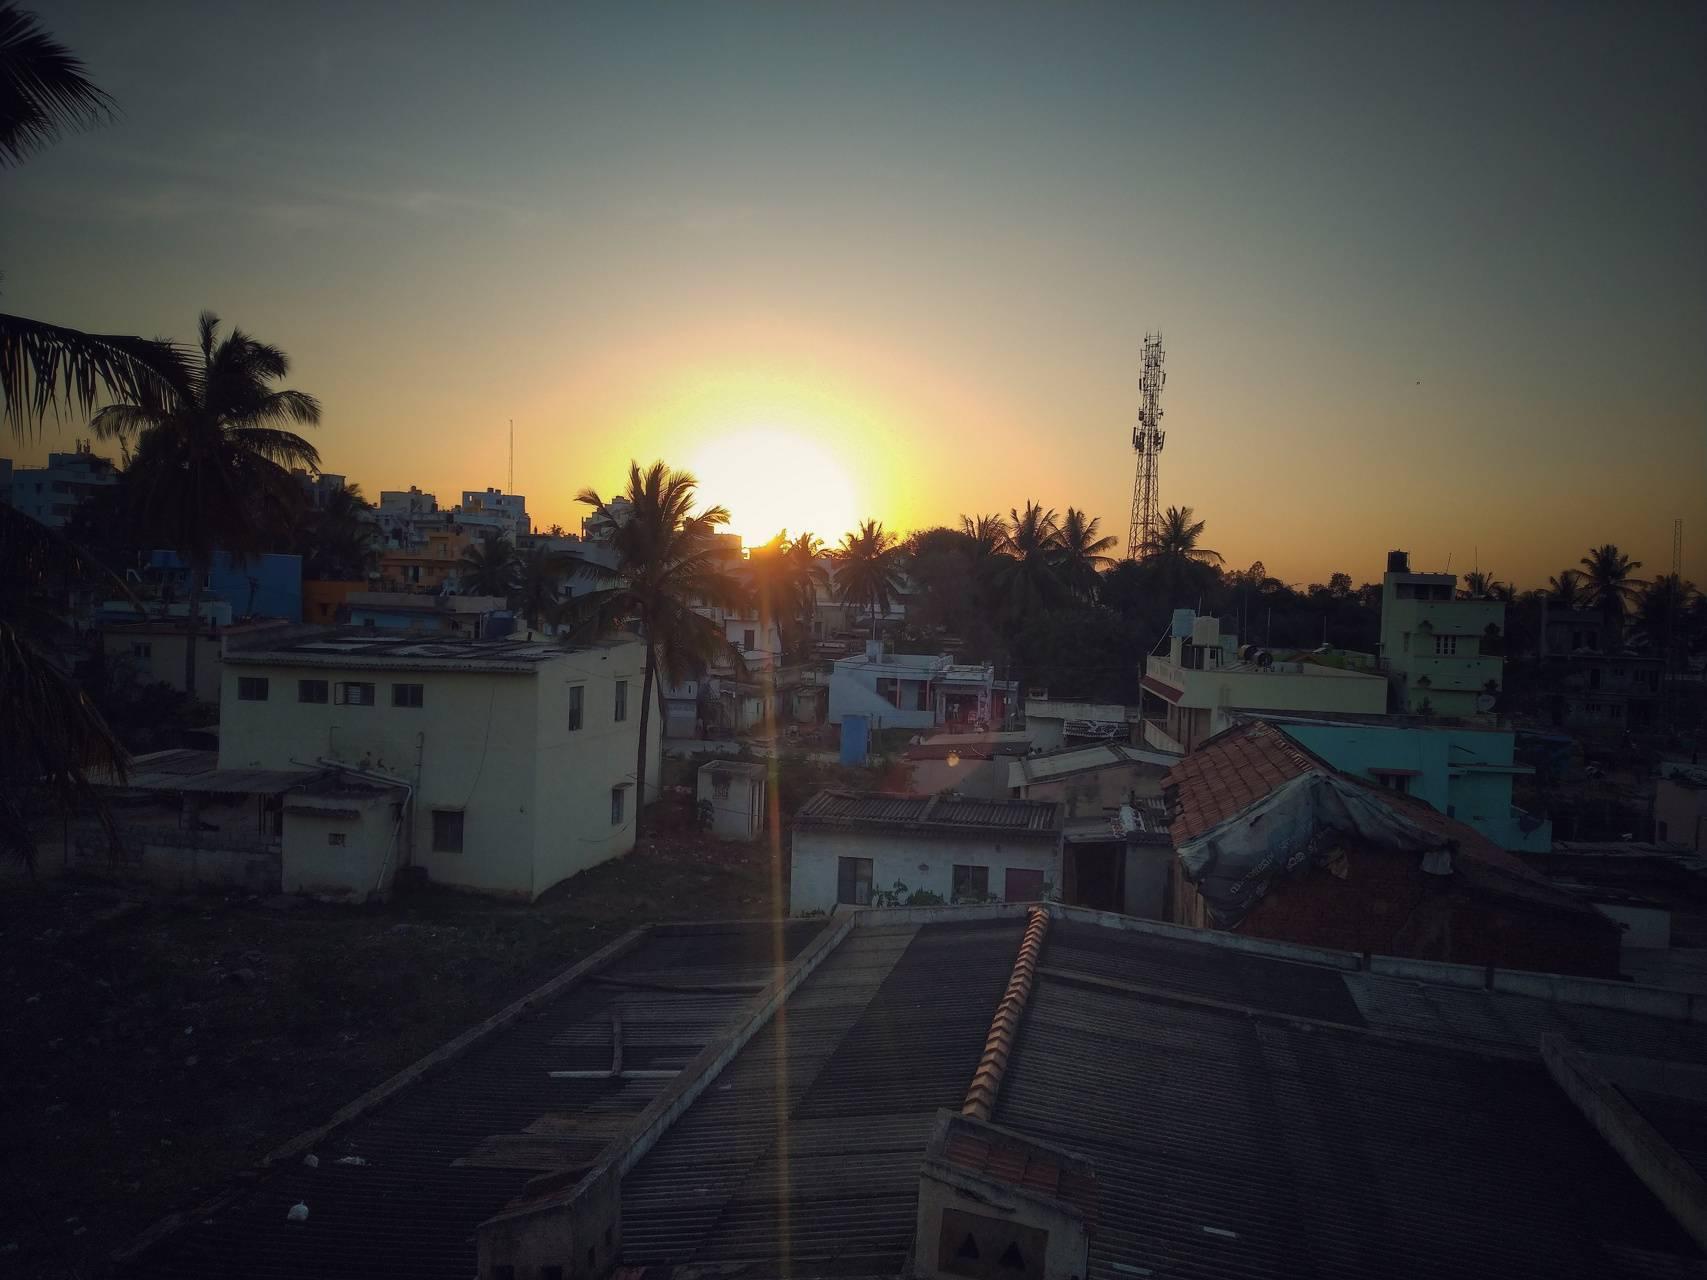 Sunrise in village